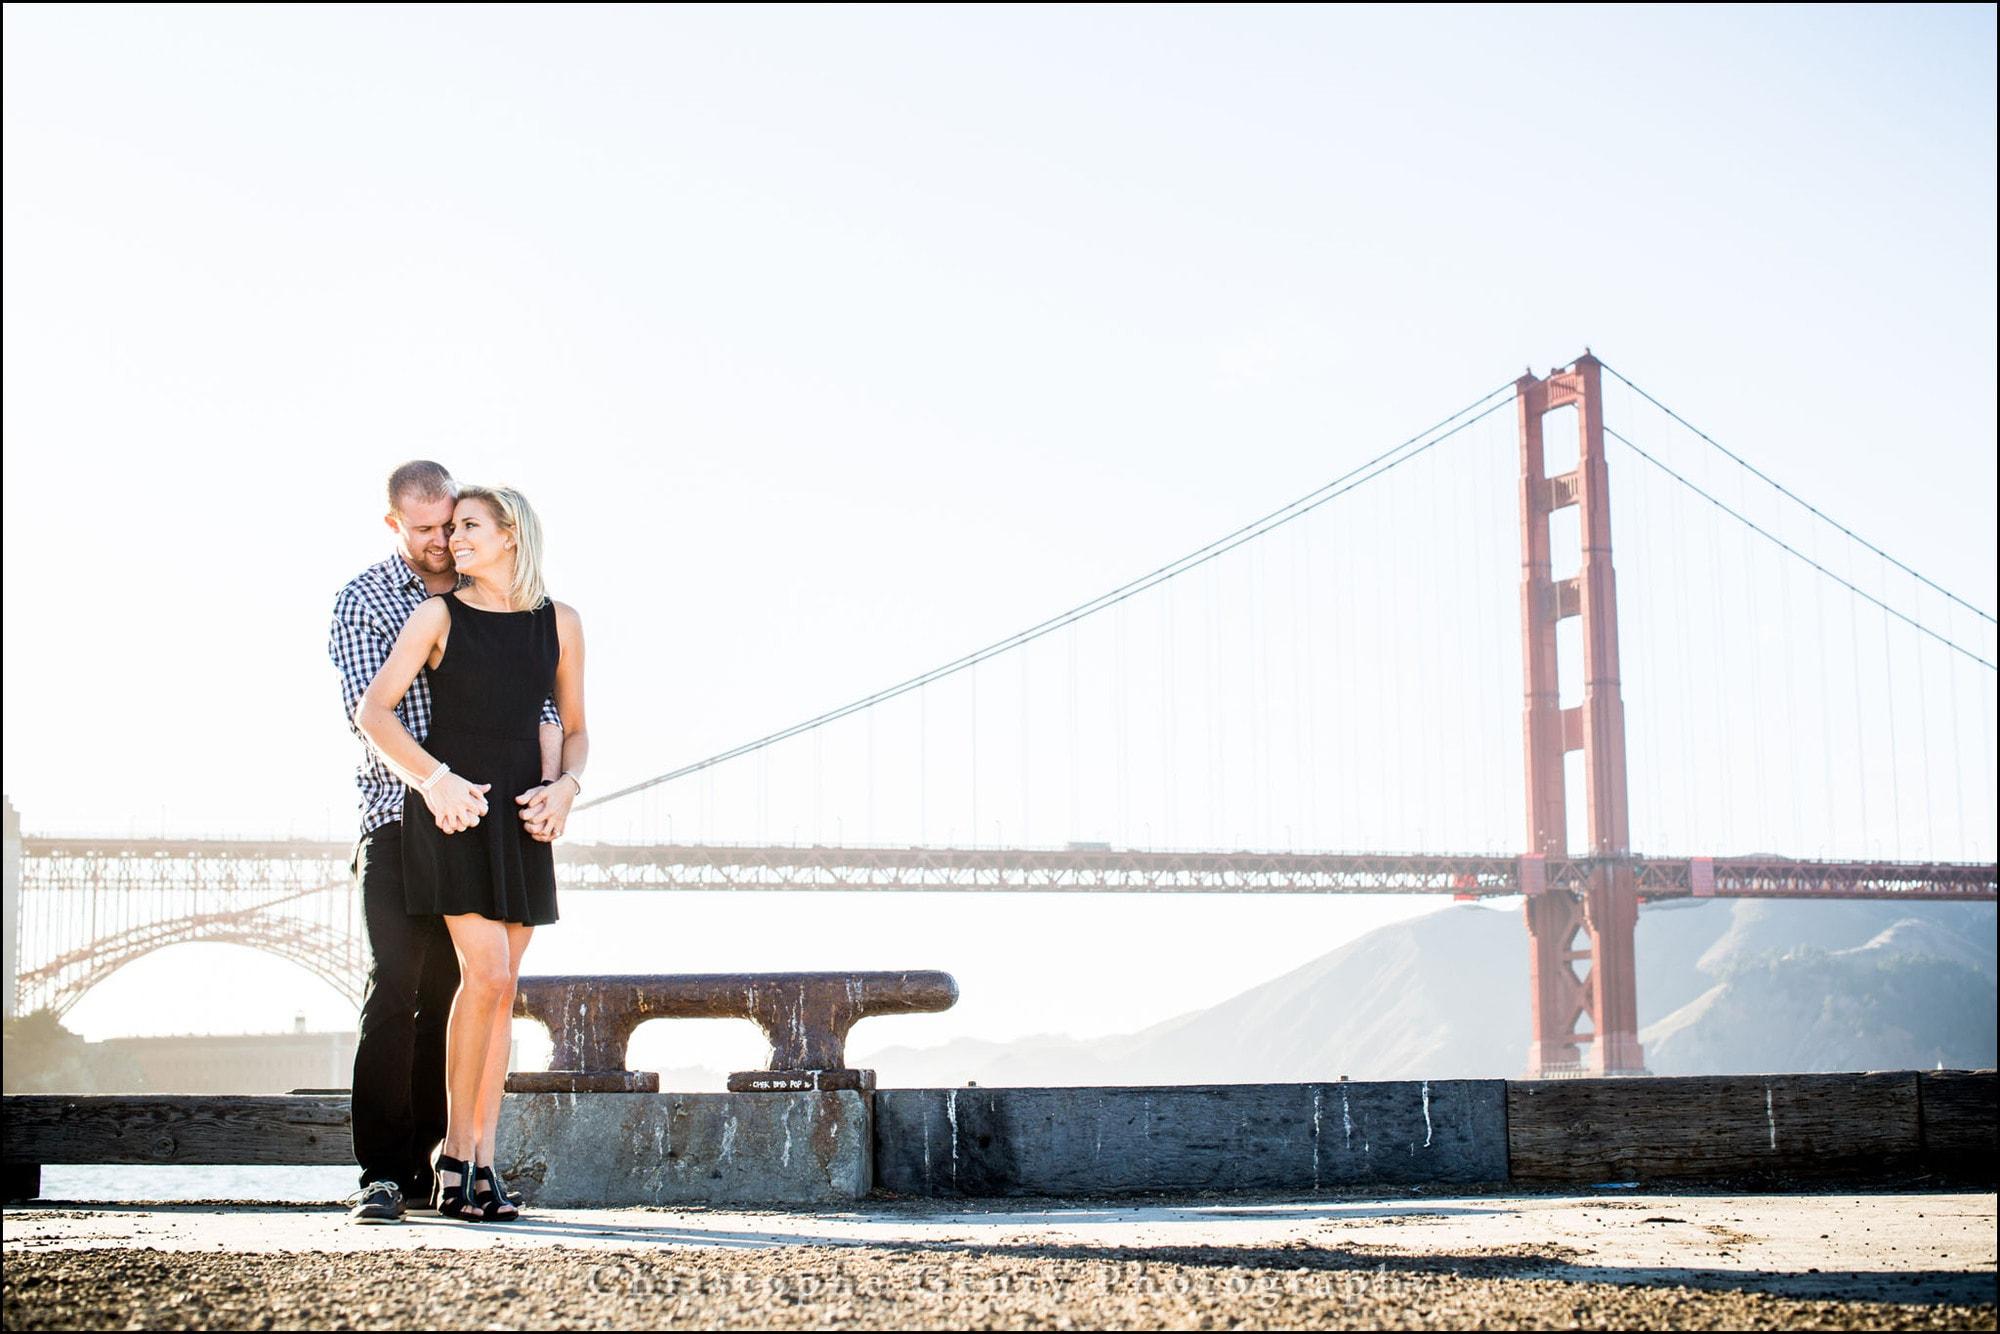 Engagement photography at Torpedo Wharf in San Francisco Bay Area, CA